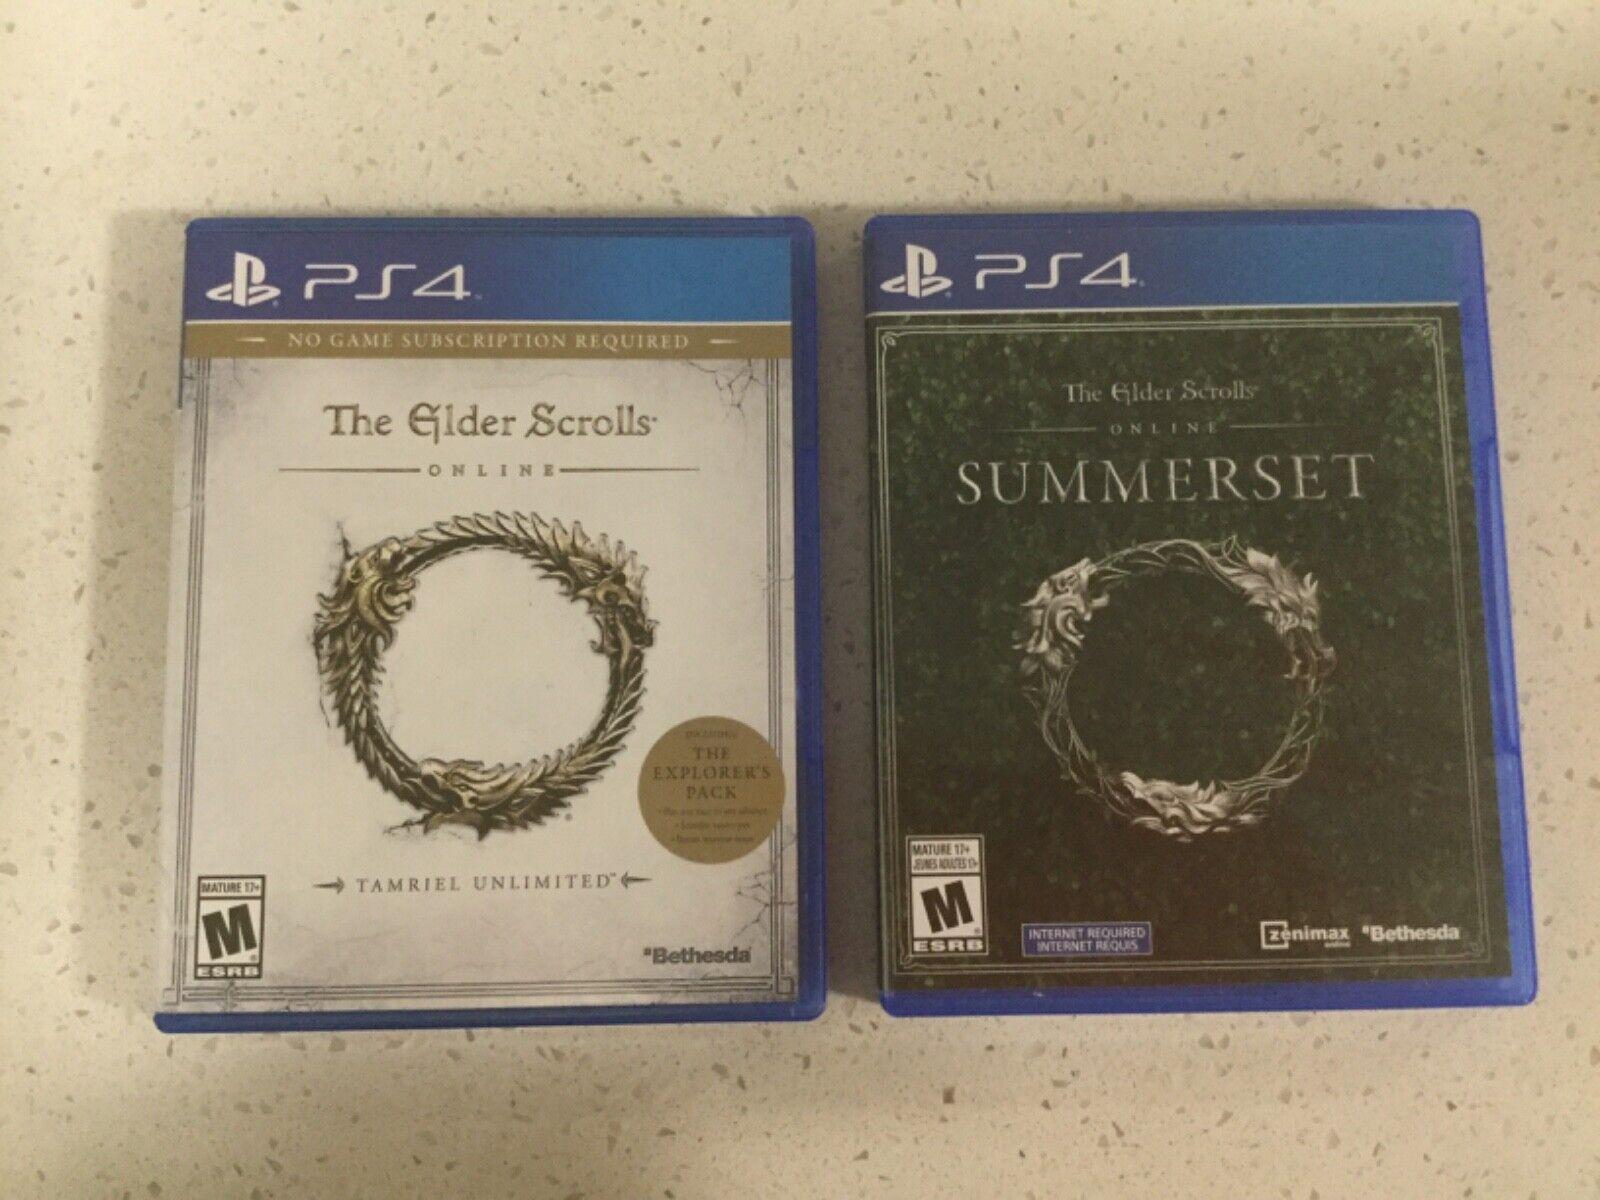 PS4 Lot Of 2 - THE ELDER SCROLLS TAMRIEL UNLIMITED SUMMERSET - $1.99